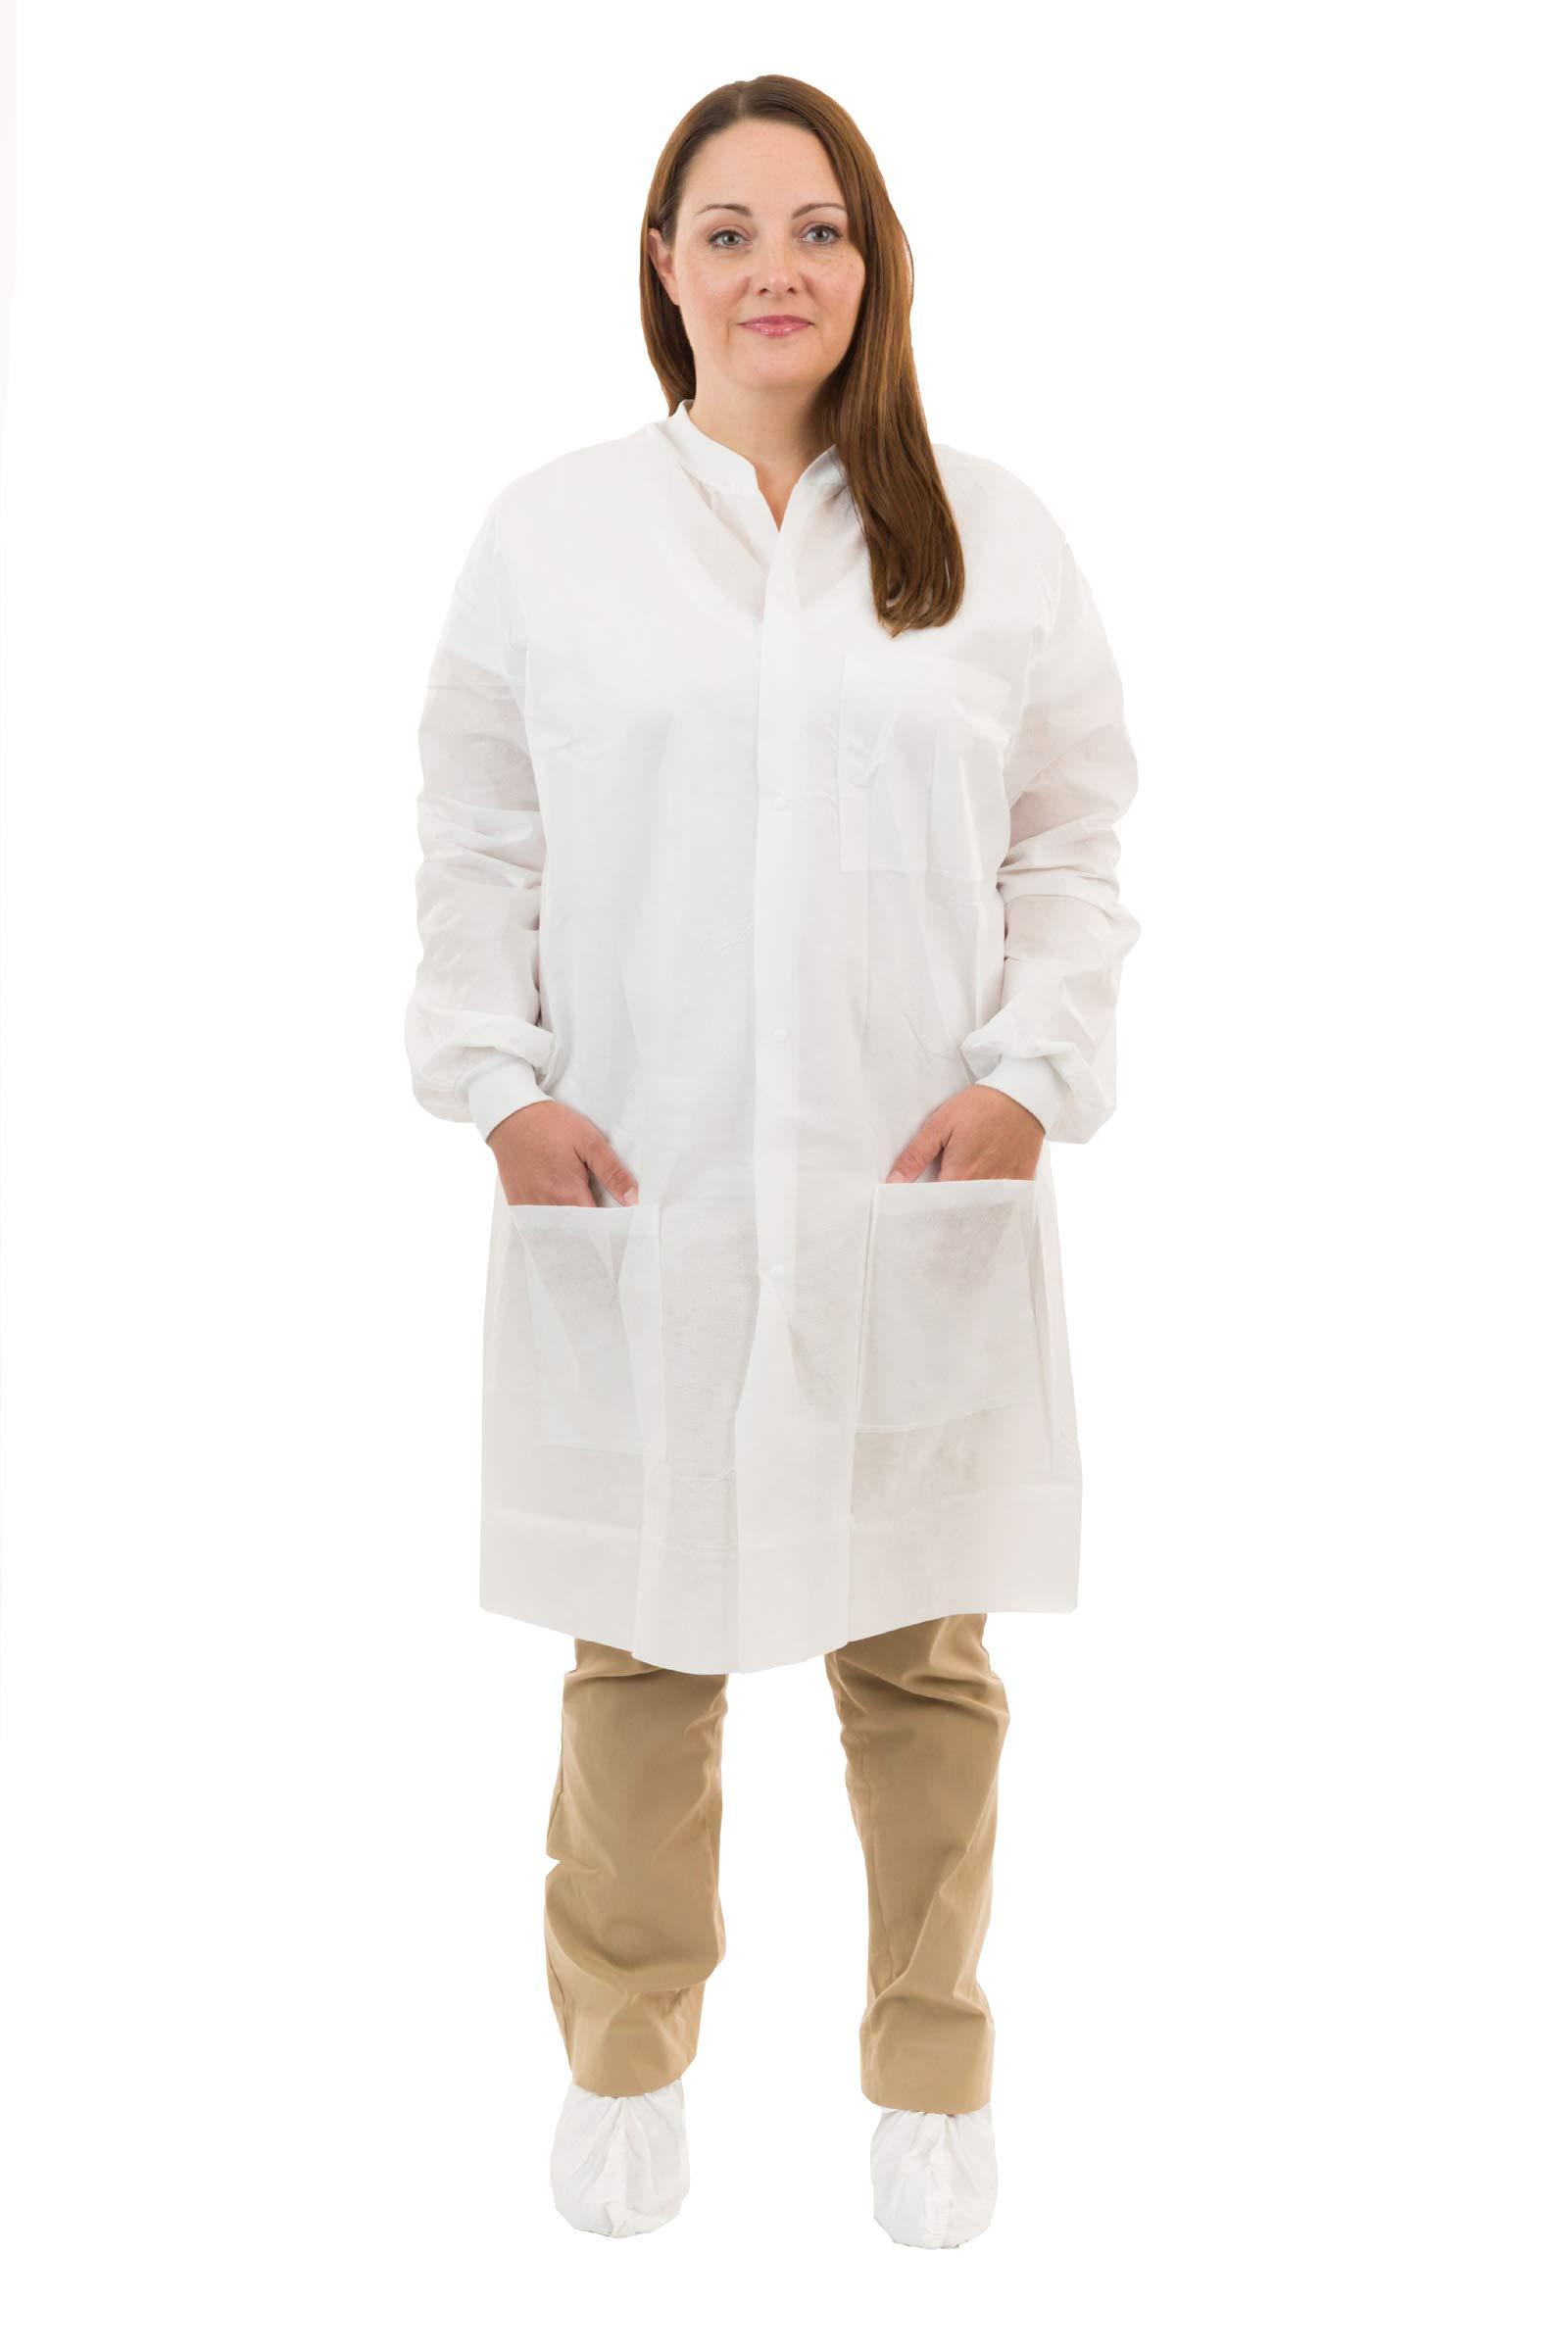 International Enviroguard Disposable White SMS Lab Coats | Medical | Dental (3 Pockets, Knit Wrist) (Medium, Case of 50)